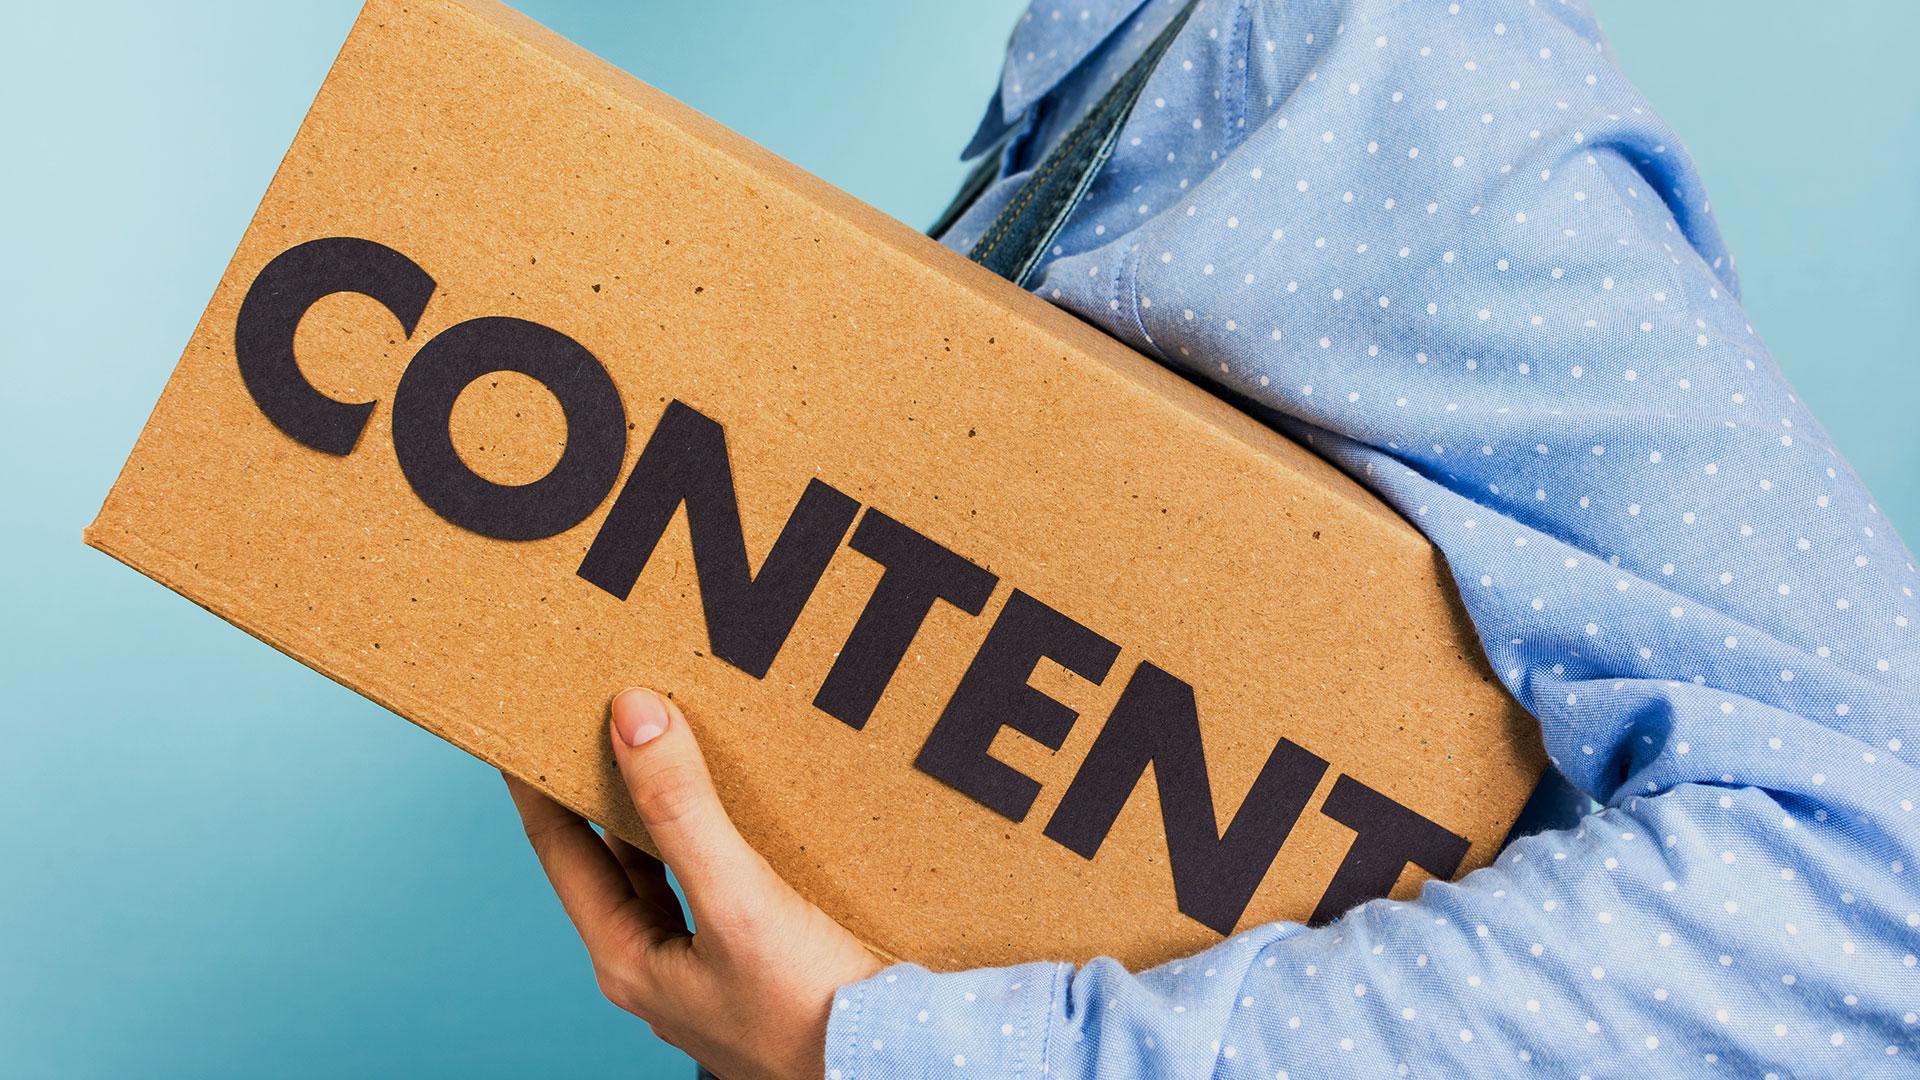 content output